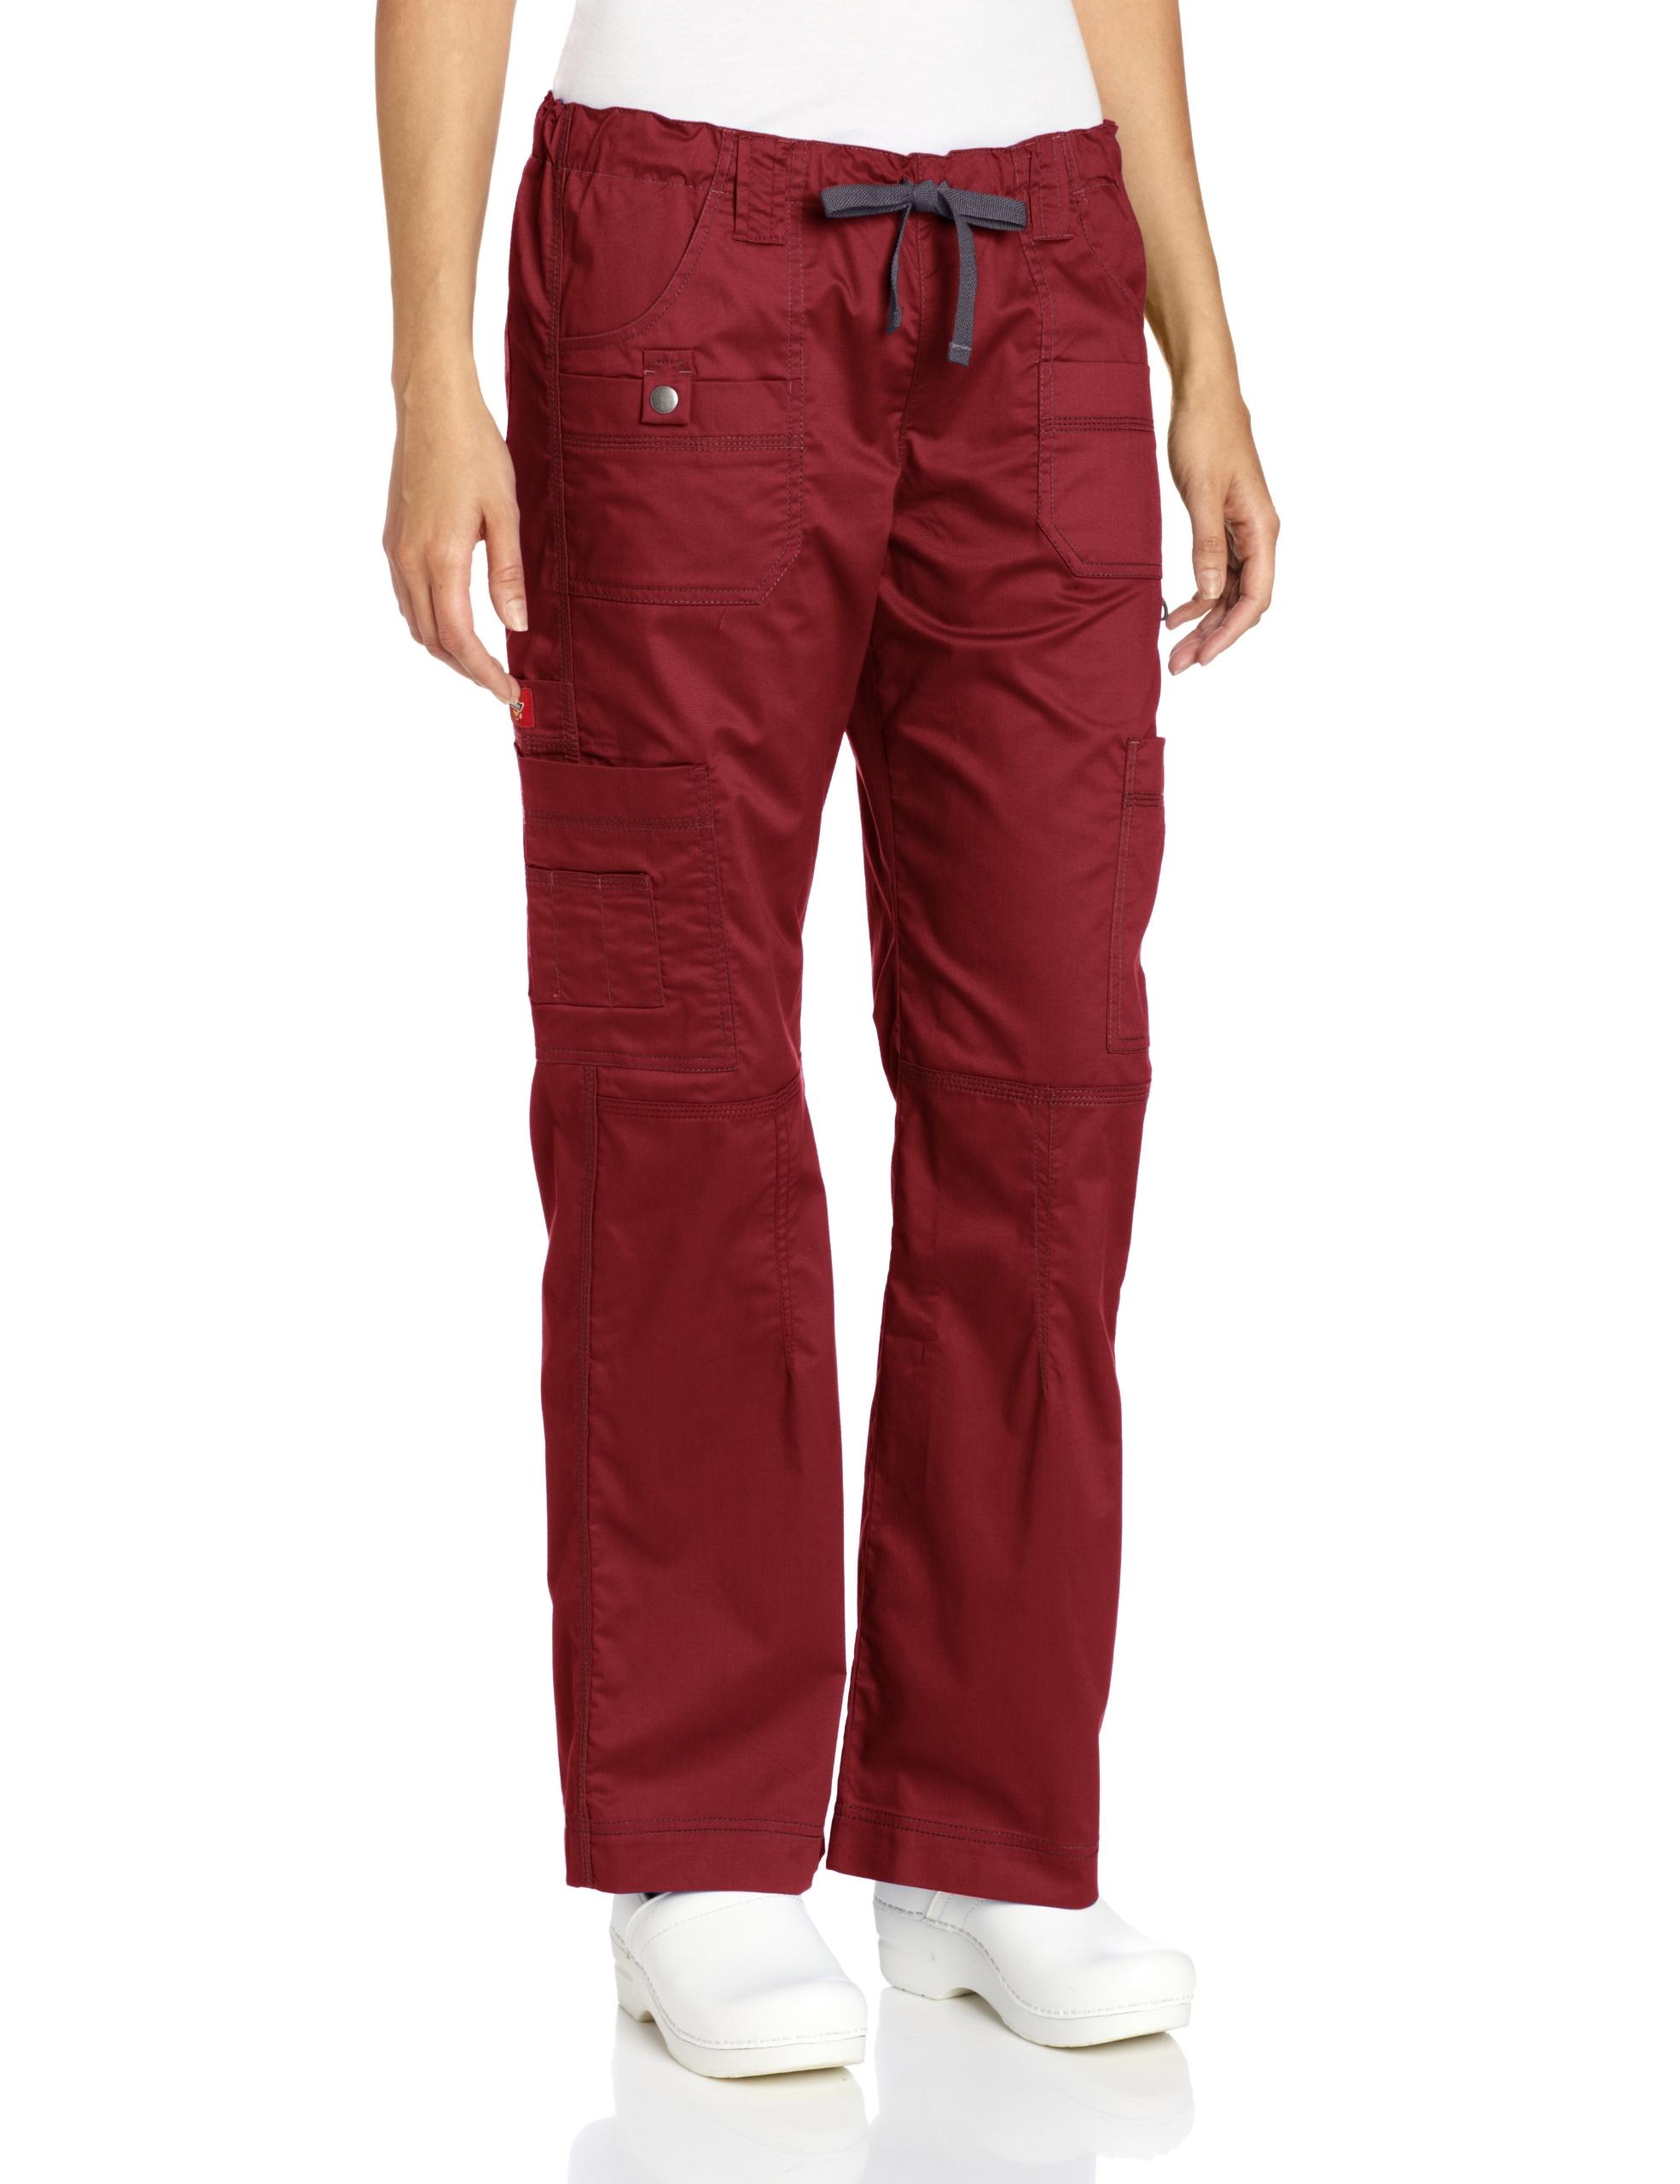 Dickies Women's Petite Gen Flex Junior Fit Contrast Stitch Cargo Pant,Wine,X-Small Petite